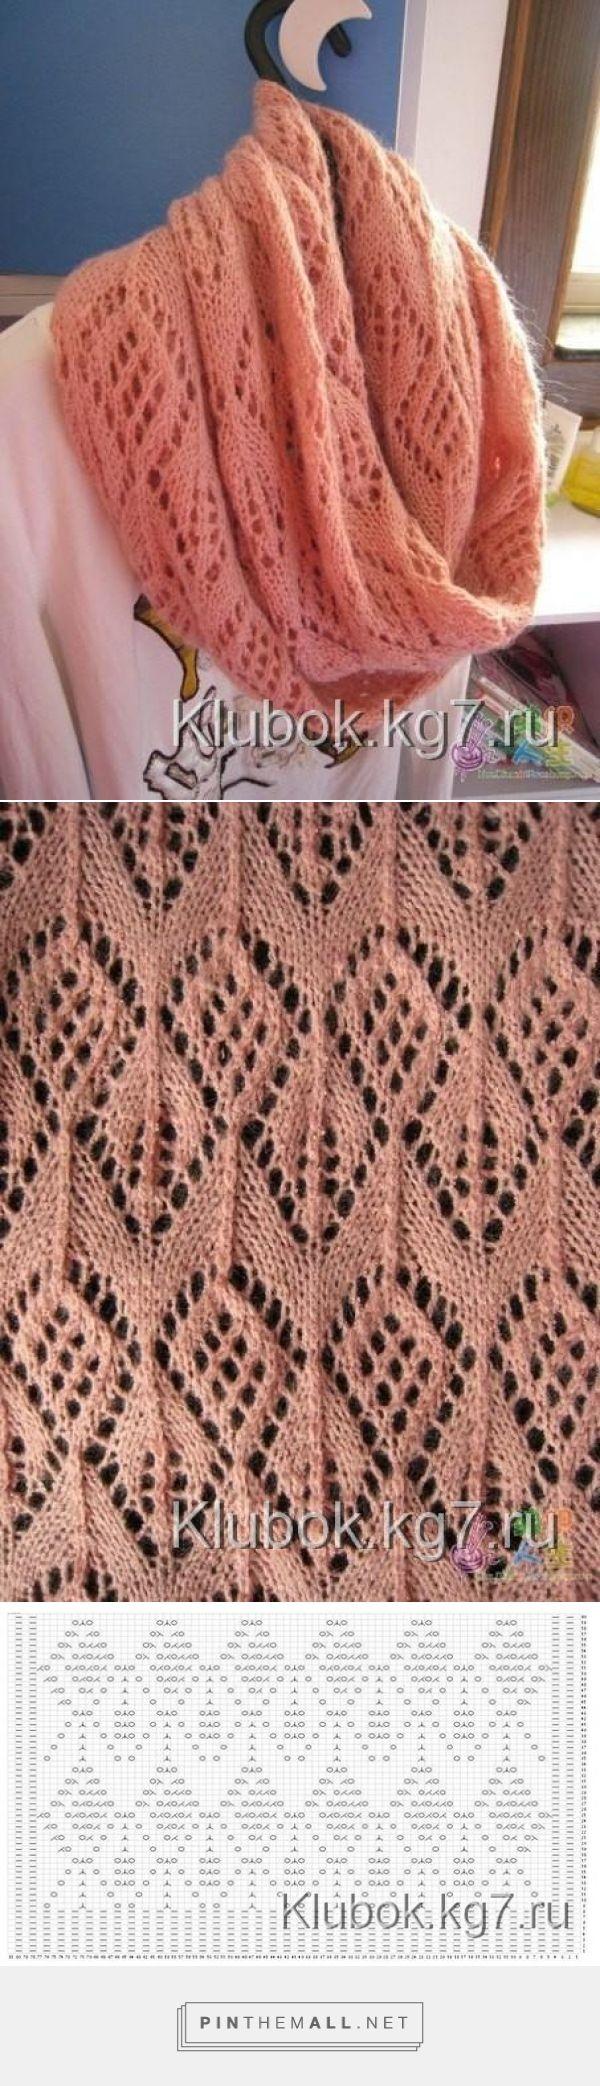 sciarpa a ferri - created via http://pinthemall.net